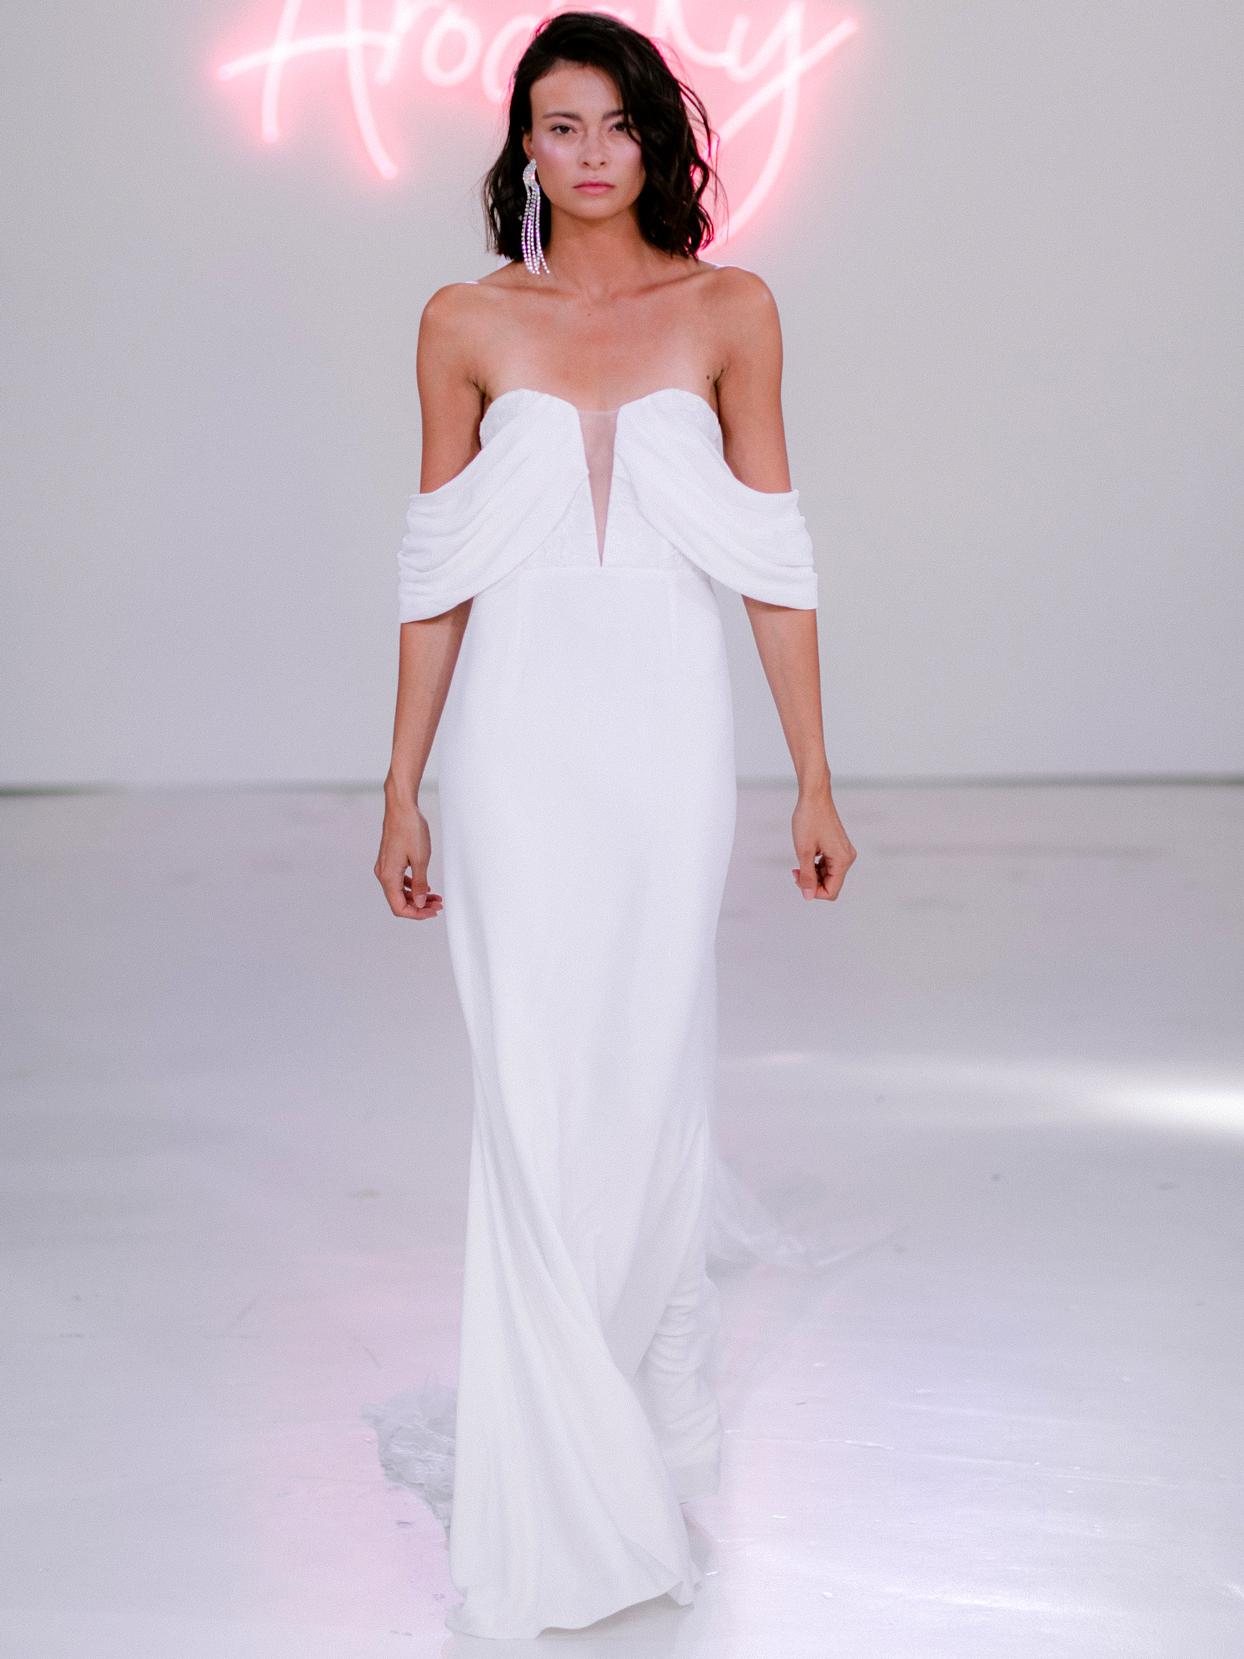 Rime Arodaky X The Mews Bridal off-the-shoulder a-line wedding dress fall 2020